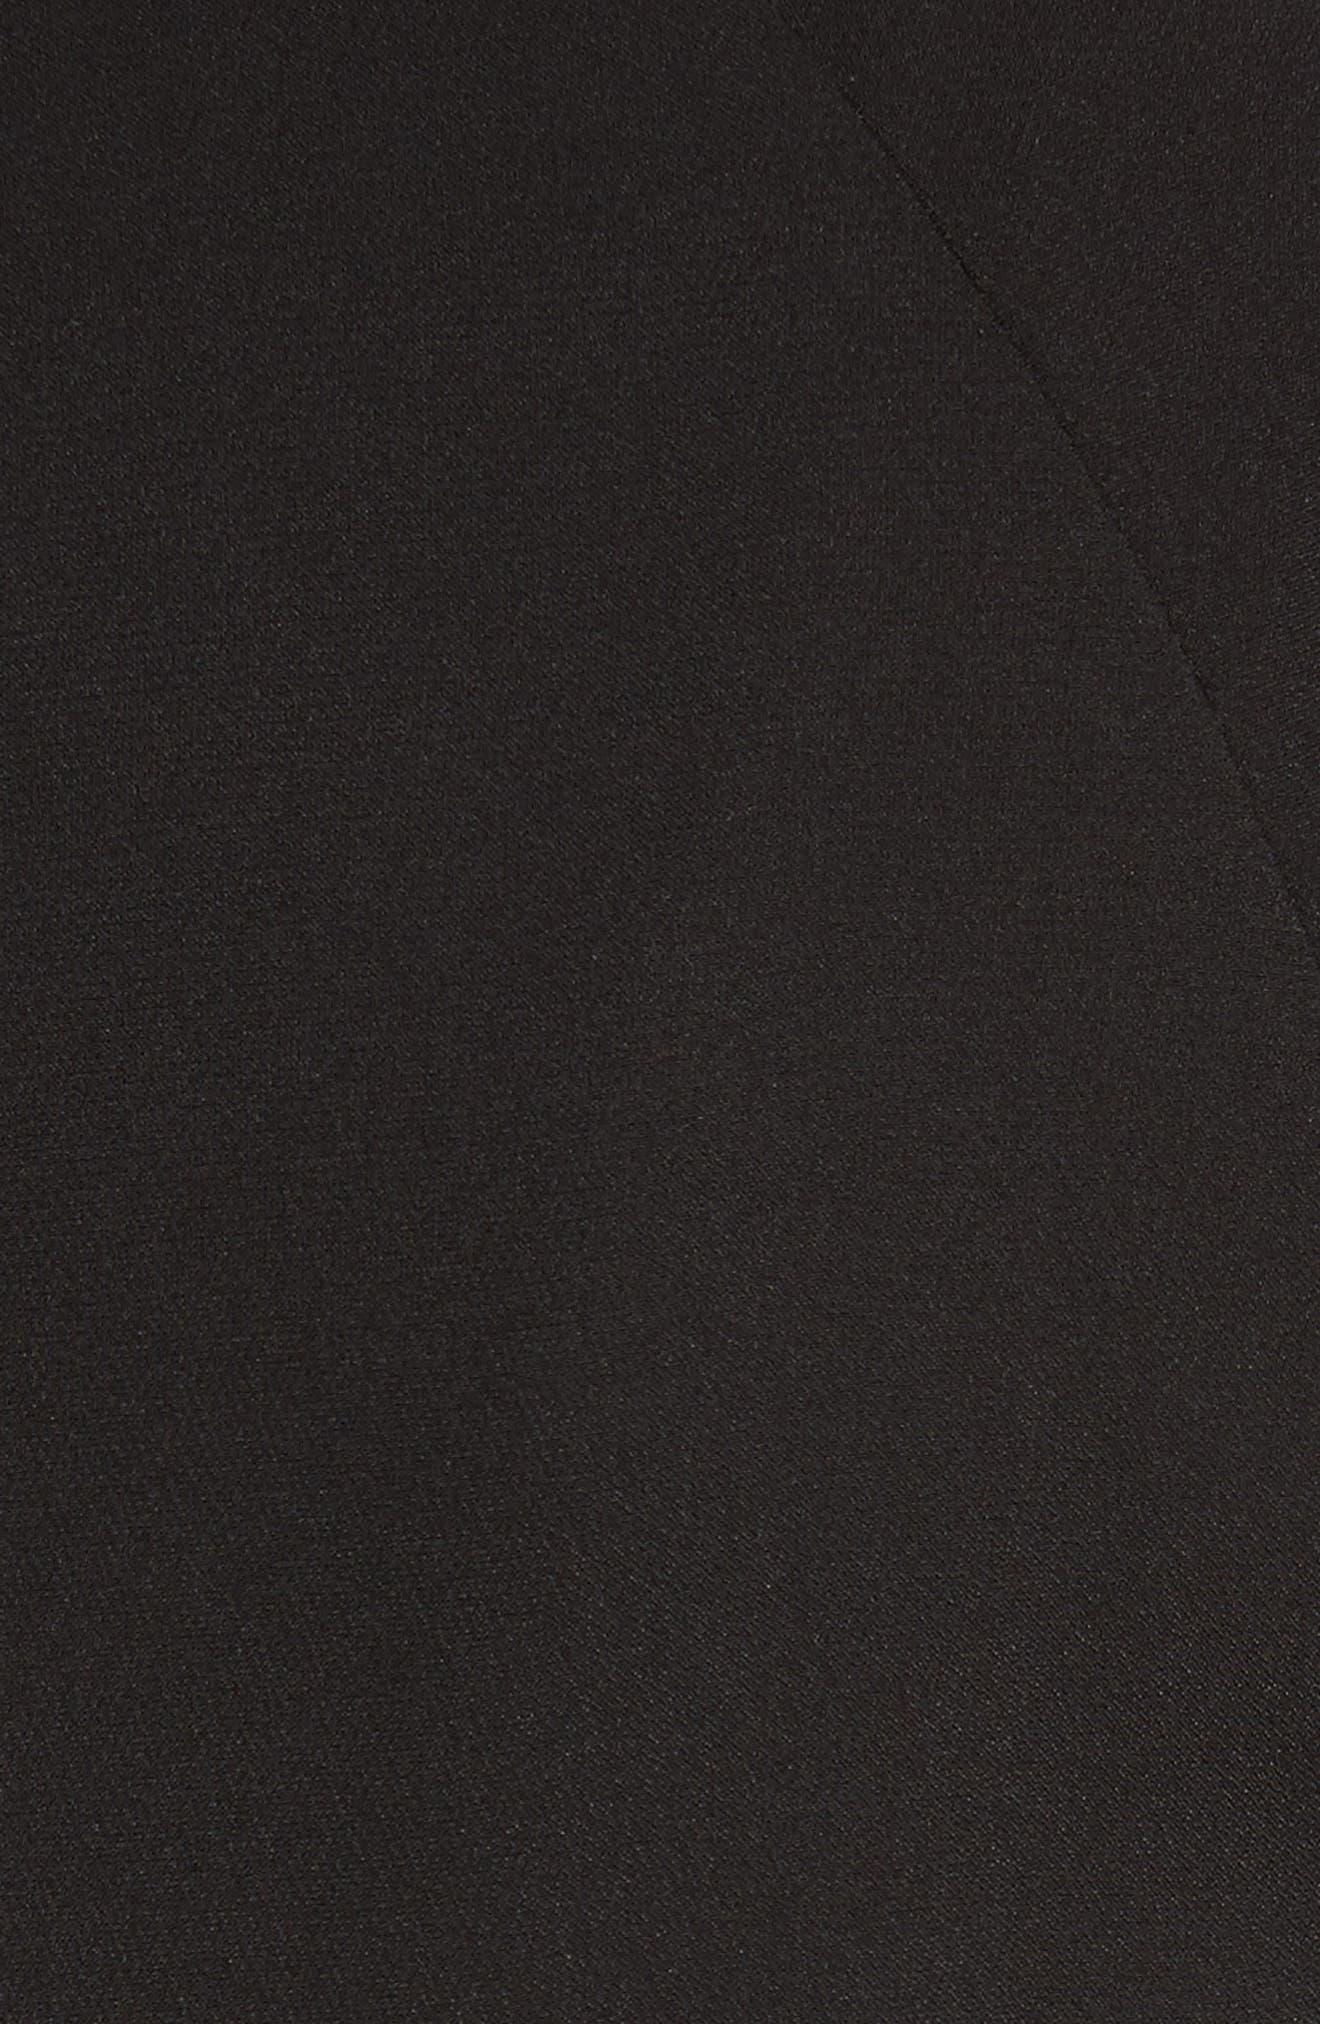 Rauma Silk Dress,                             Alternate thumbnail 5, color,                             001